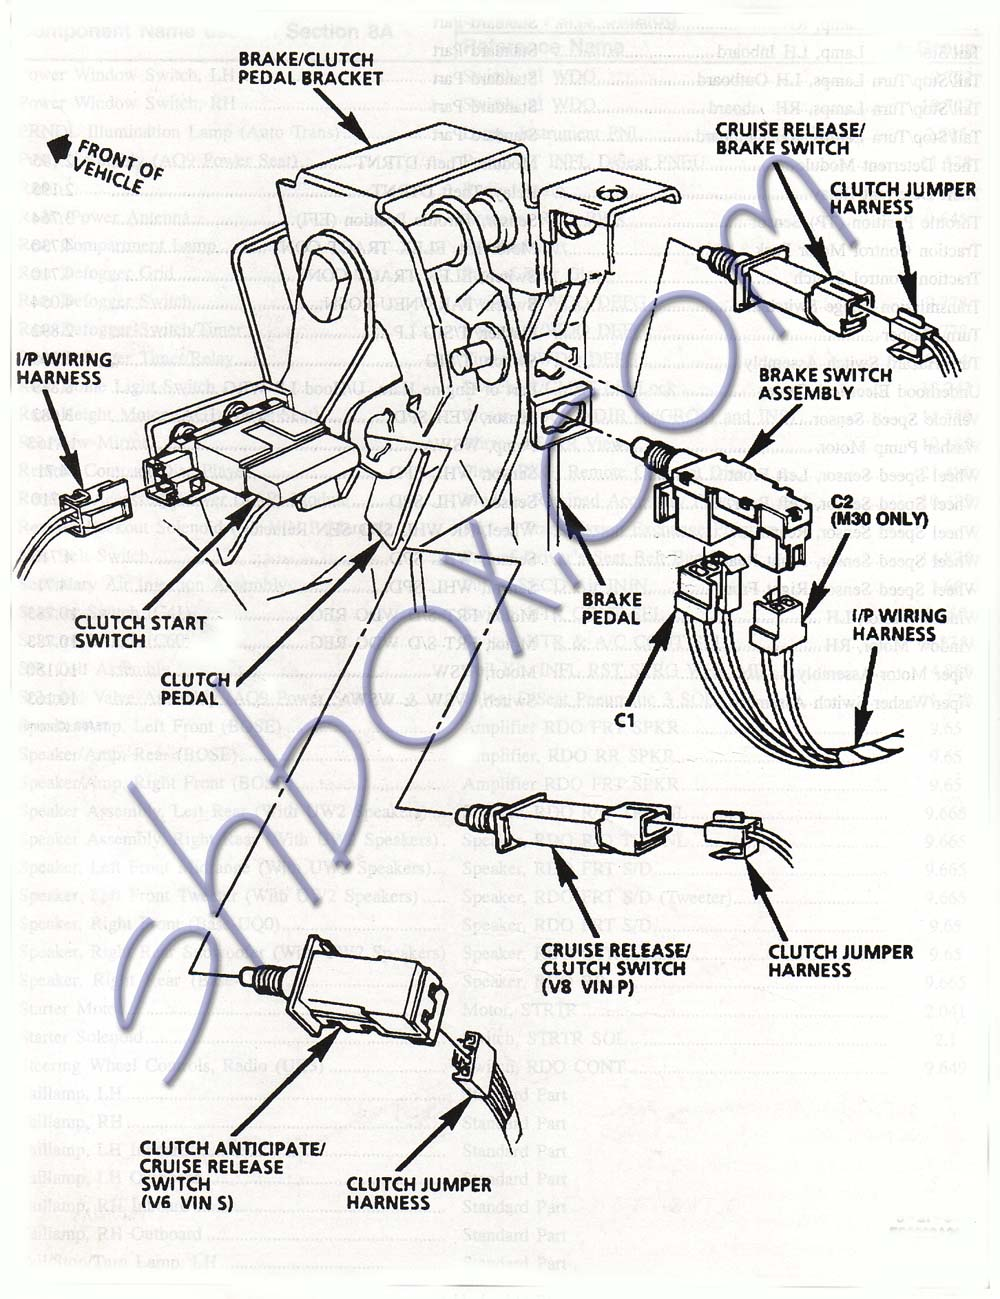 Shbox 1 pedal assy 1